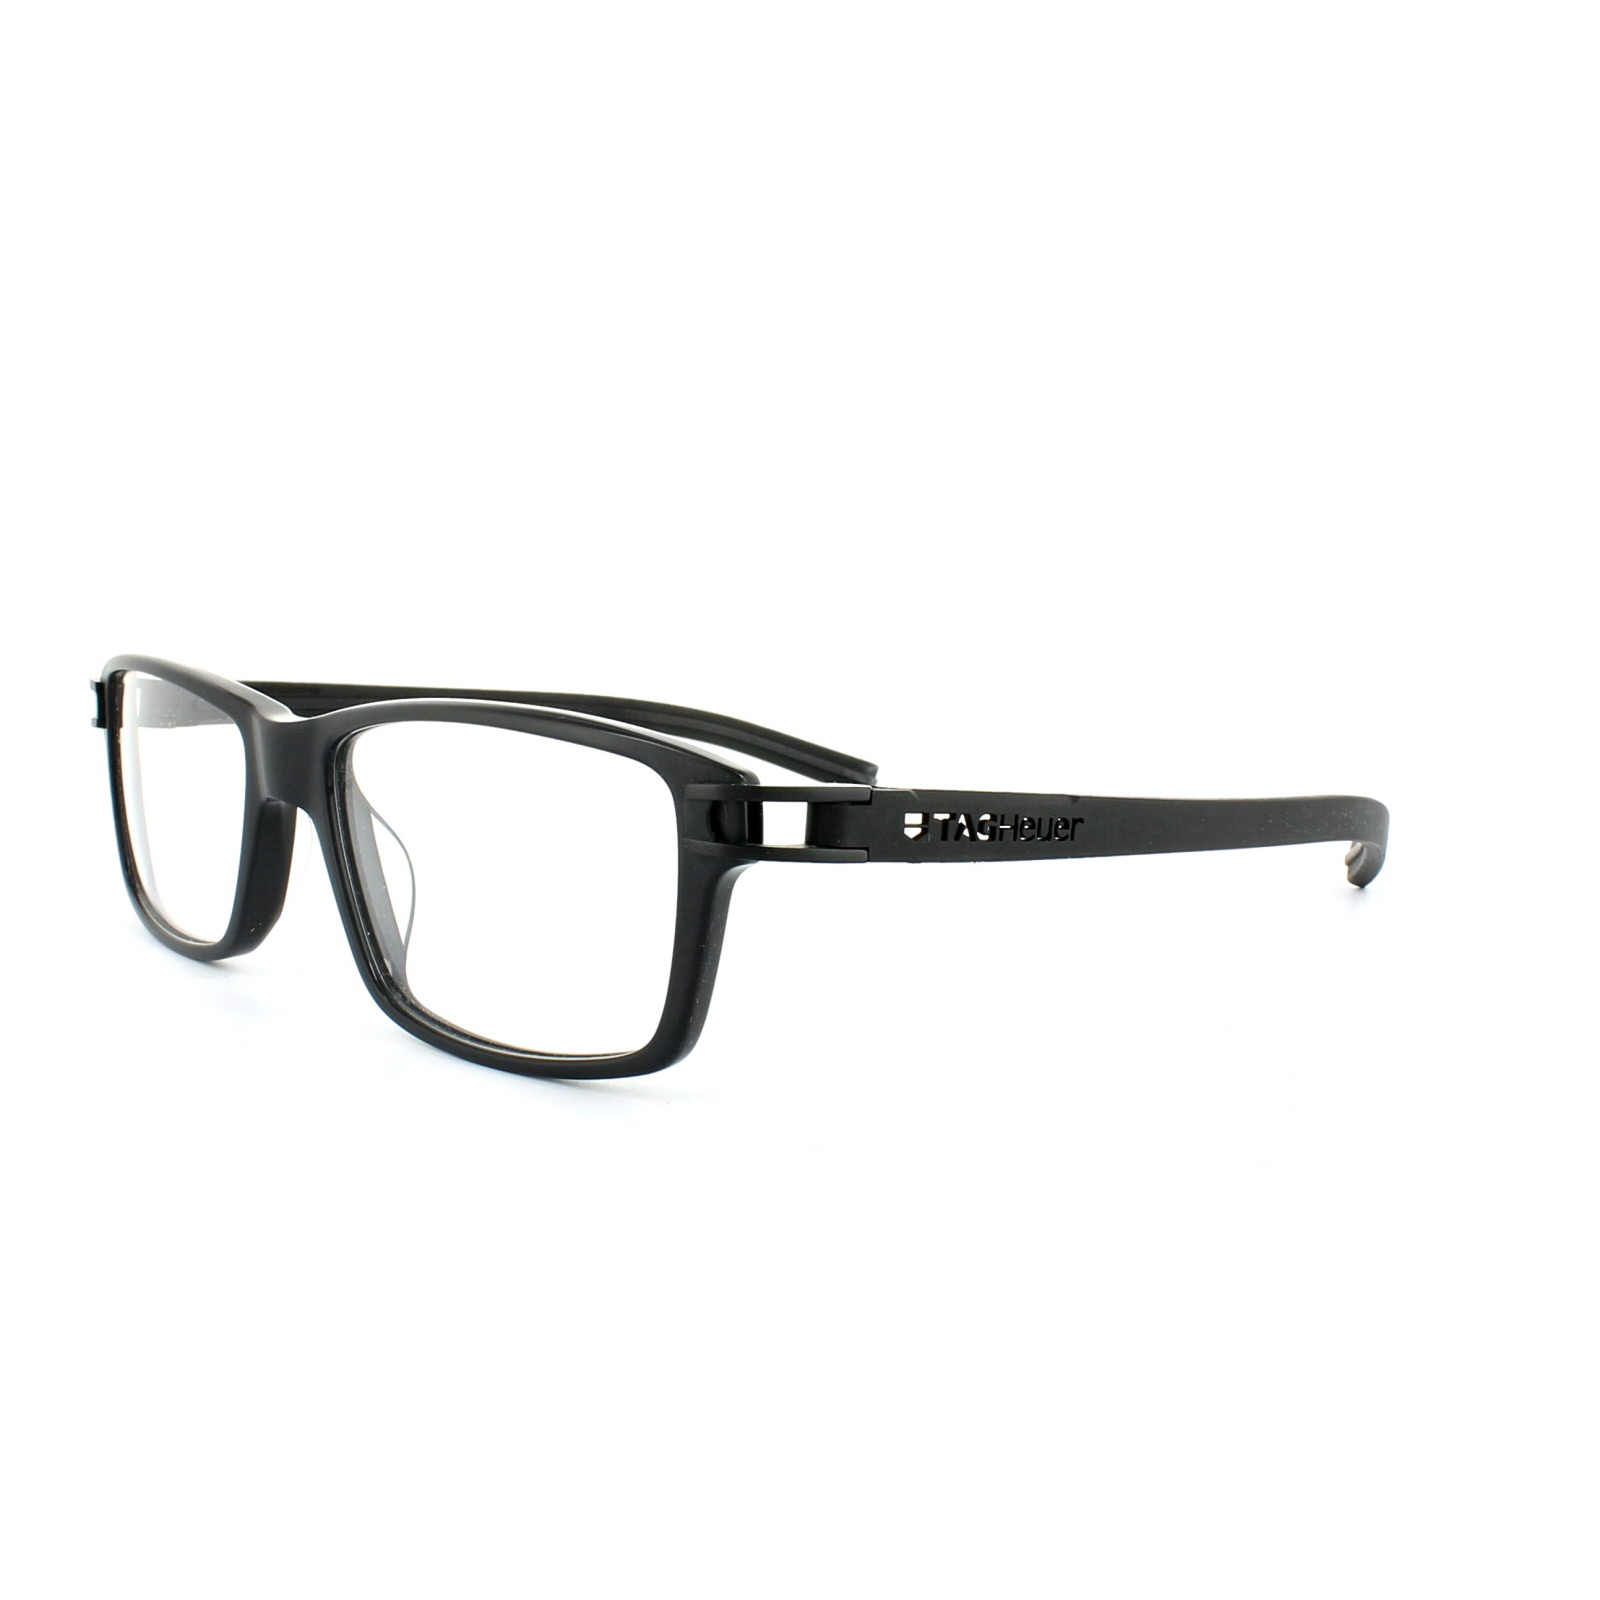 tag heuer eye frames price